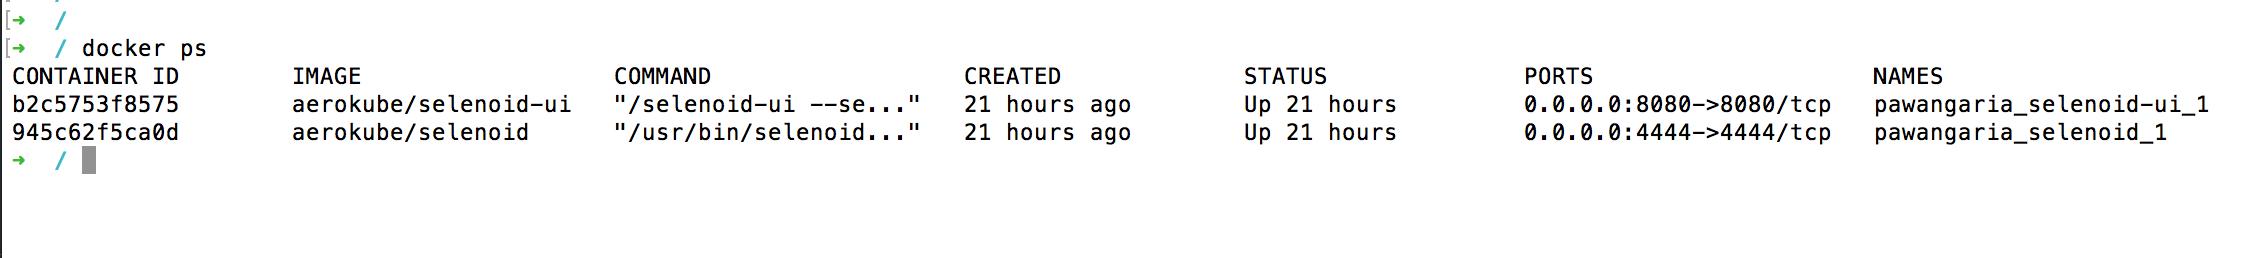 docker-compose-up-status